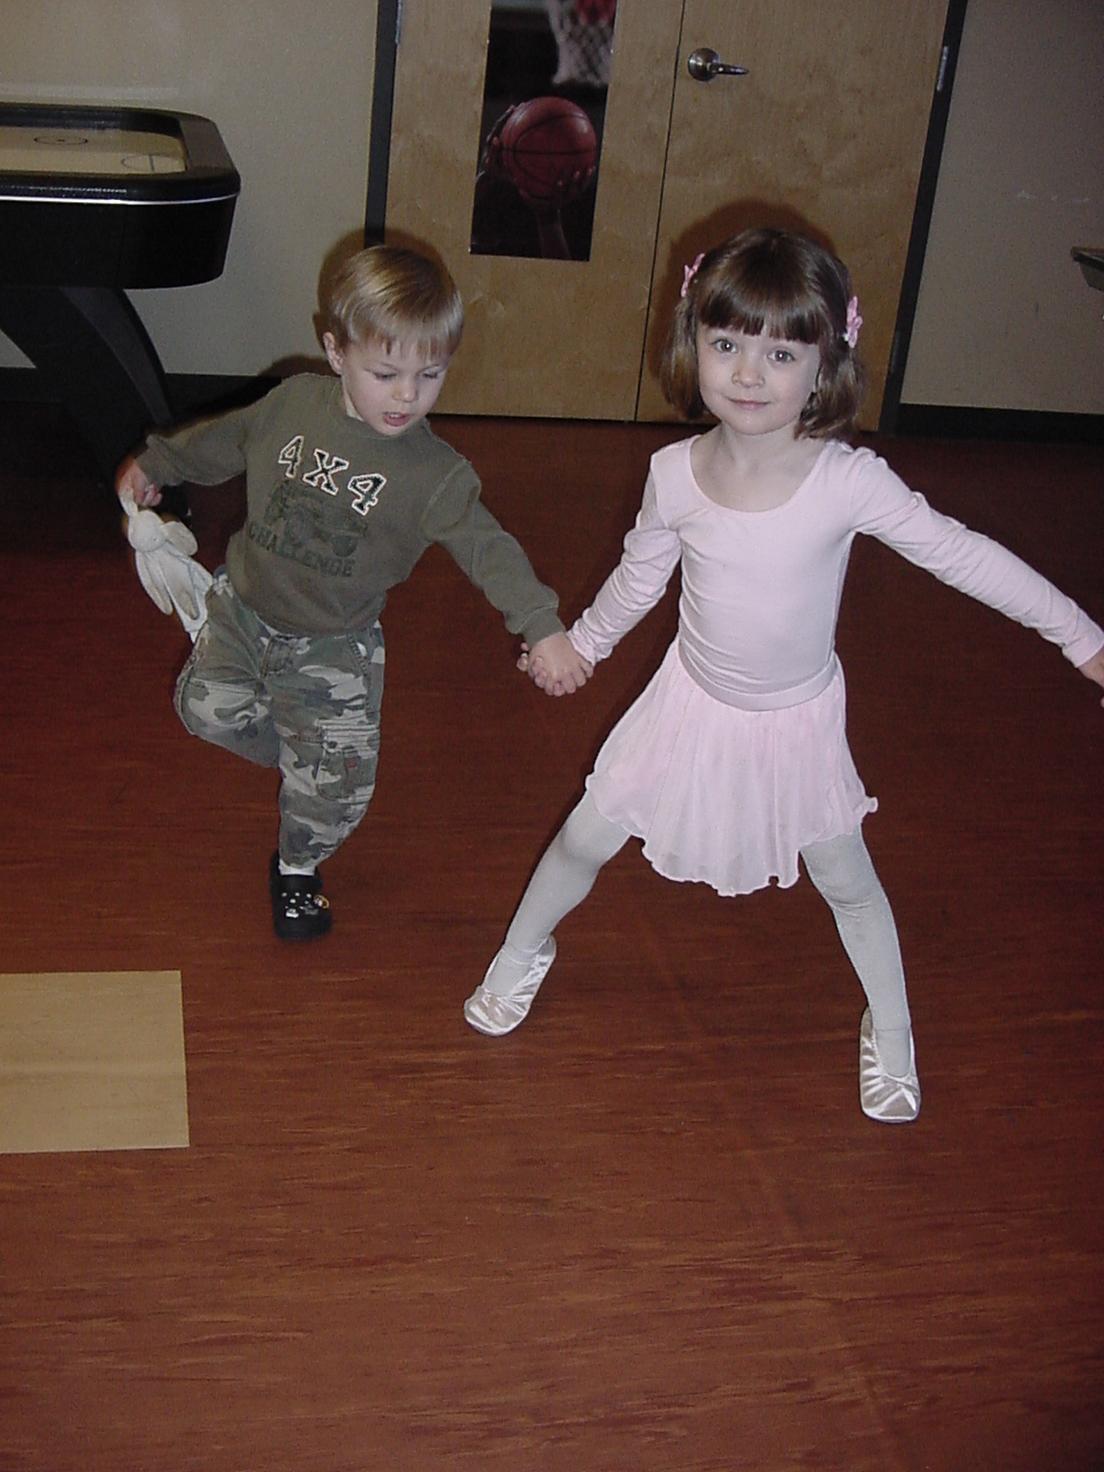 2009-02-17-allison-in-ballet-leotard-3-showing-carter-how-to-do-passe.JPG